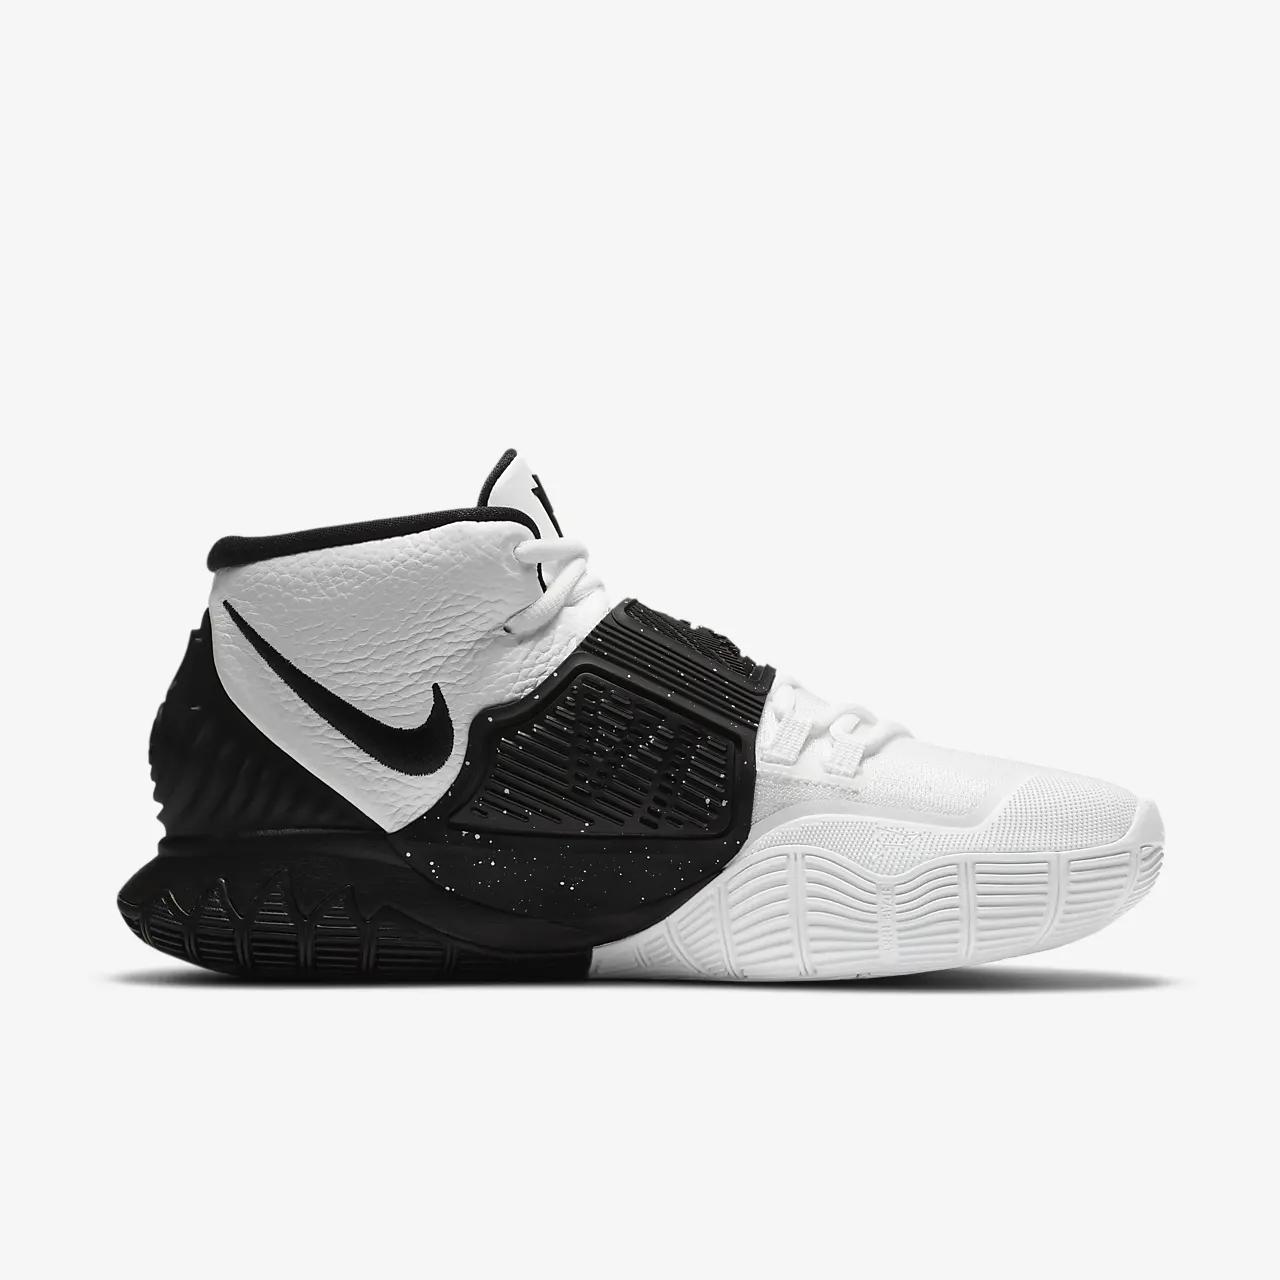 Kyrie 6 (Team) Basketball Shoe CK5869-101